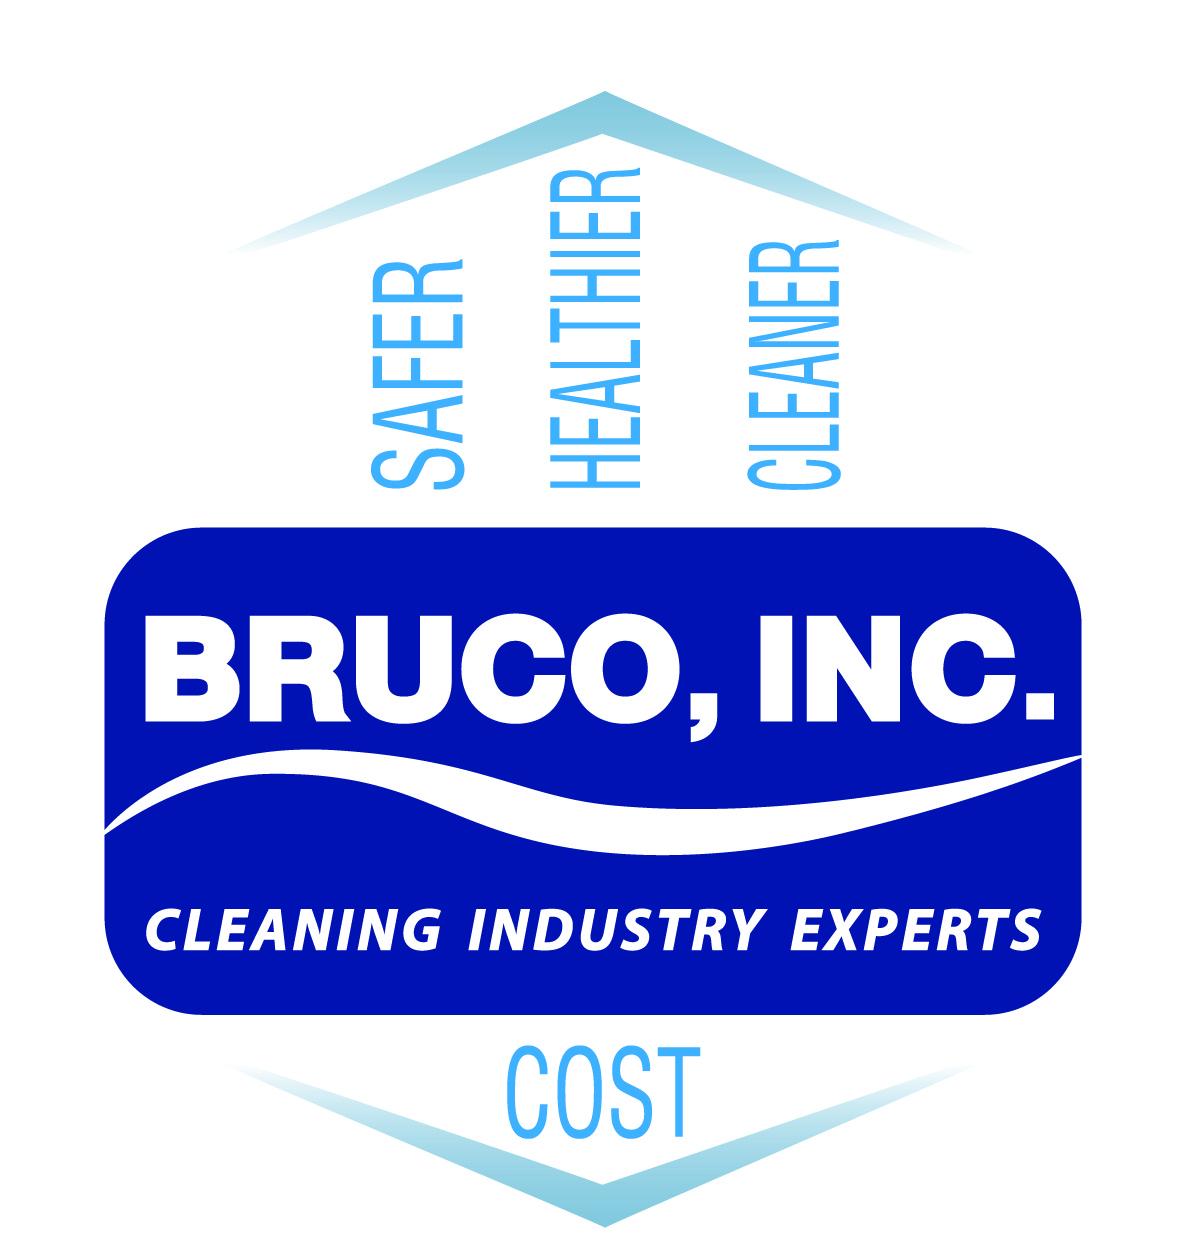 BRUCO Lower Cost Logo.jpg - 883.12 Kb